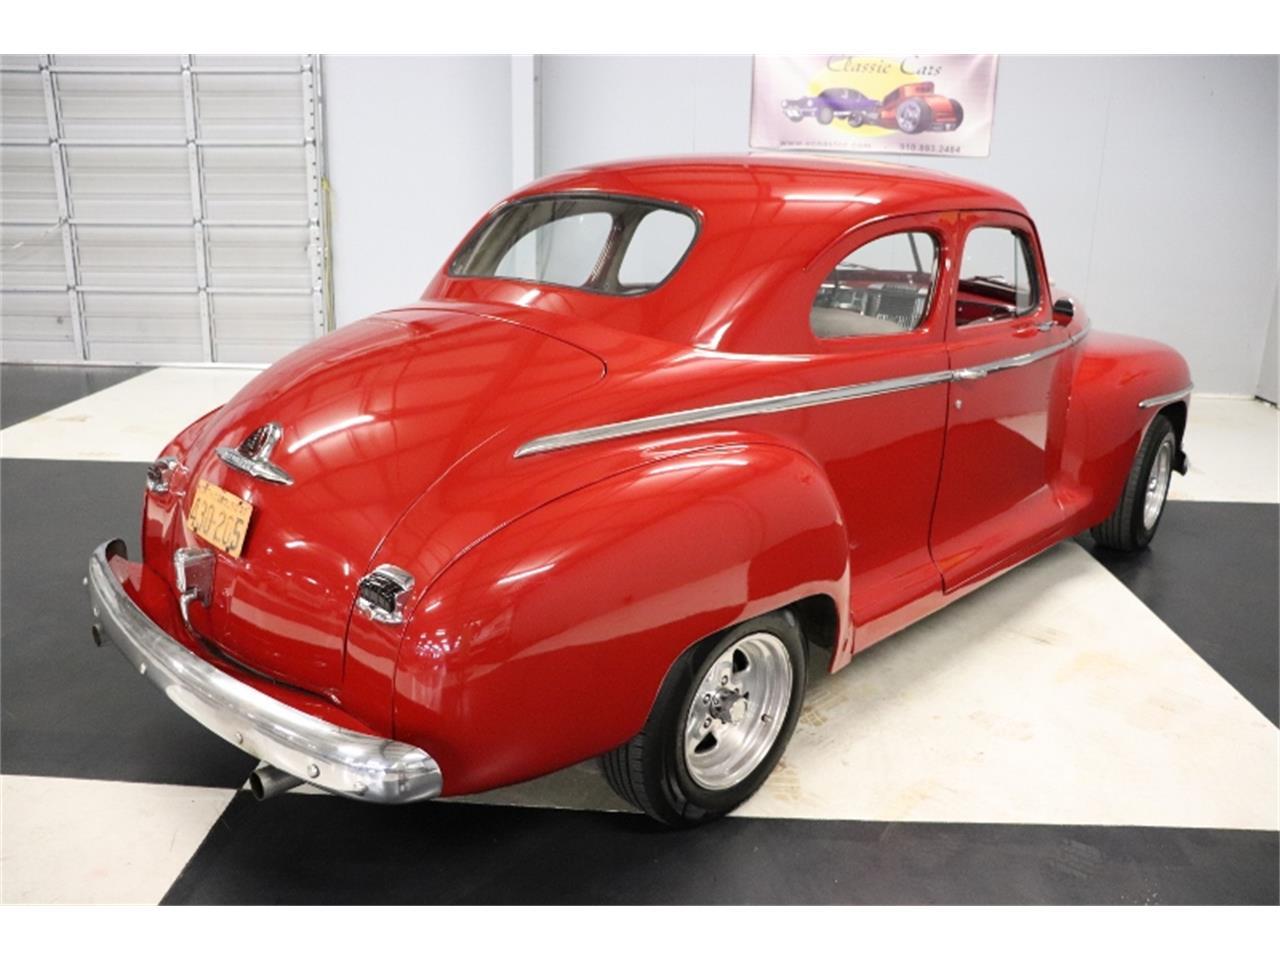 1947 Plymouth Coupe (CC-1392117) for sale in Lillington, North Carolina